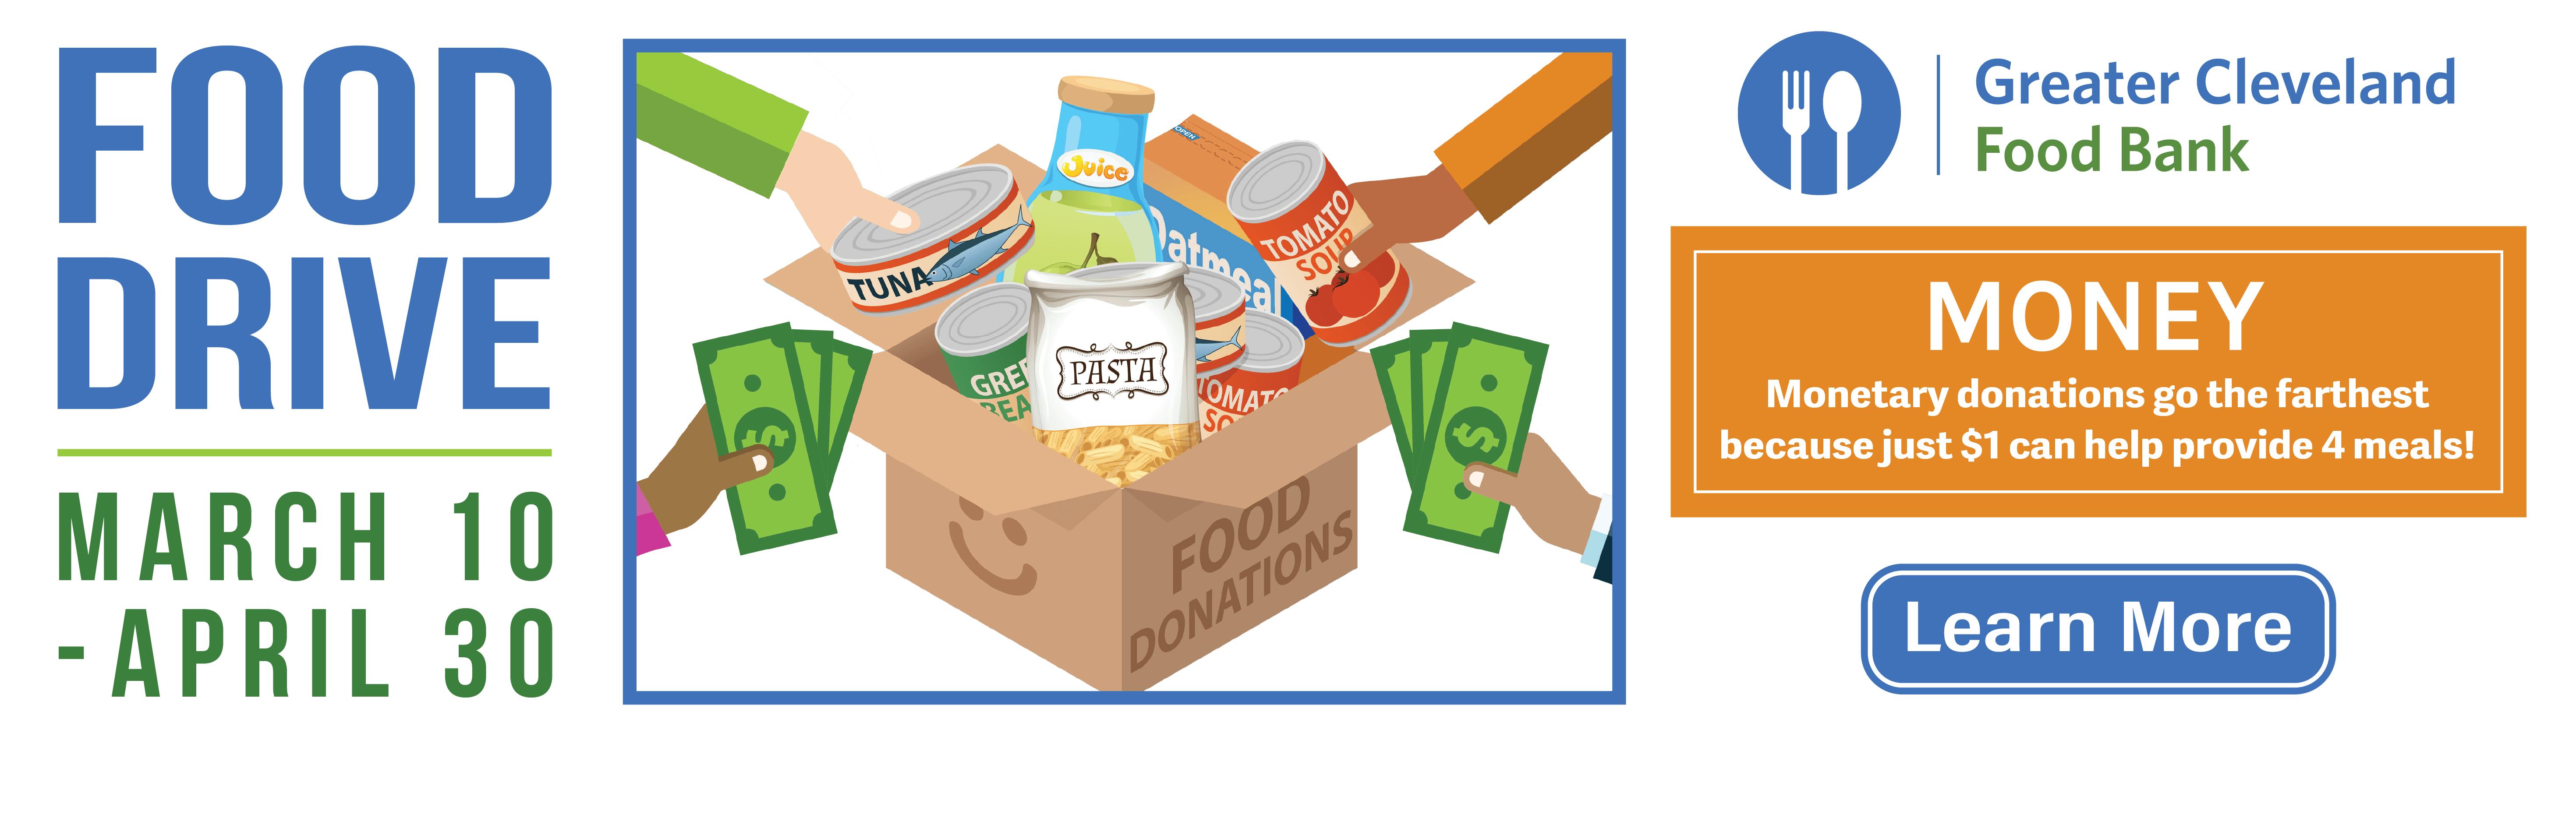 2021 Cle Food Bank Food Drive